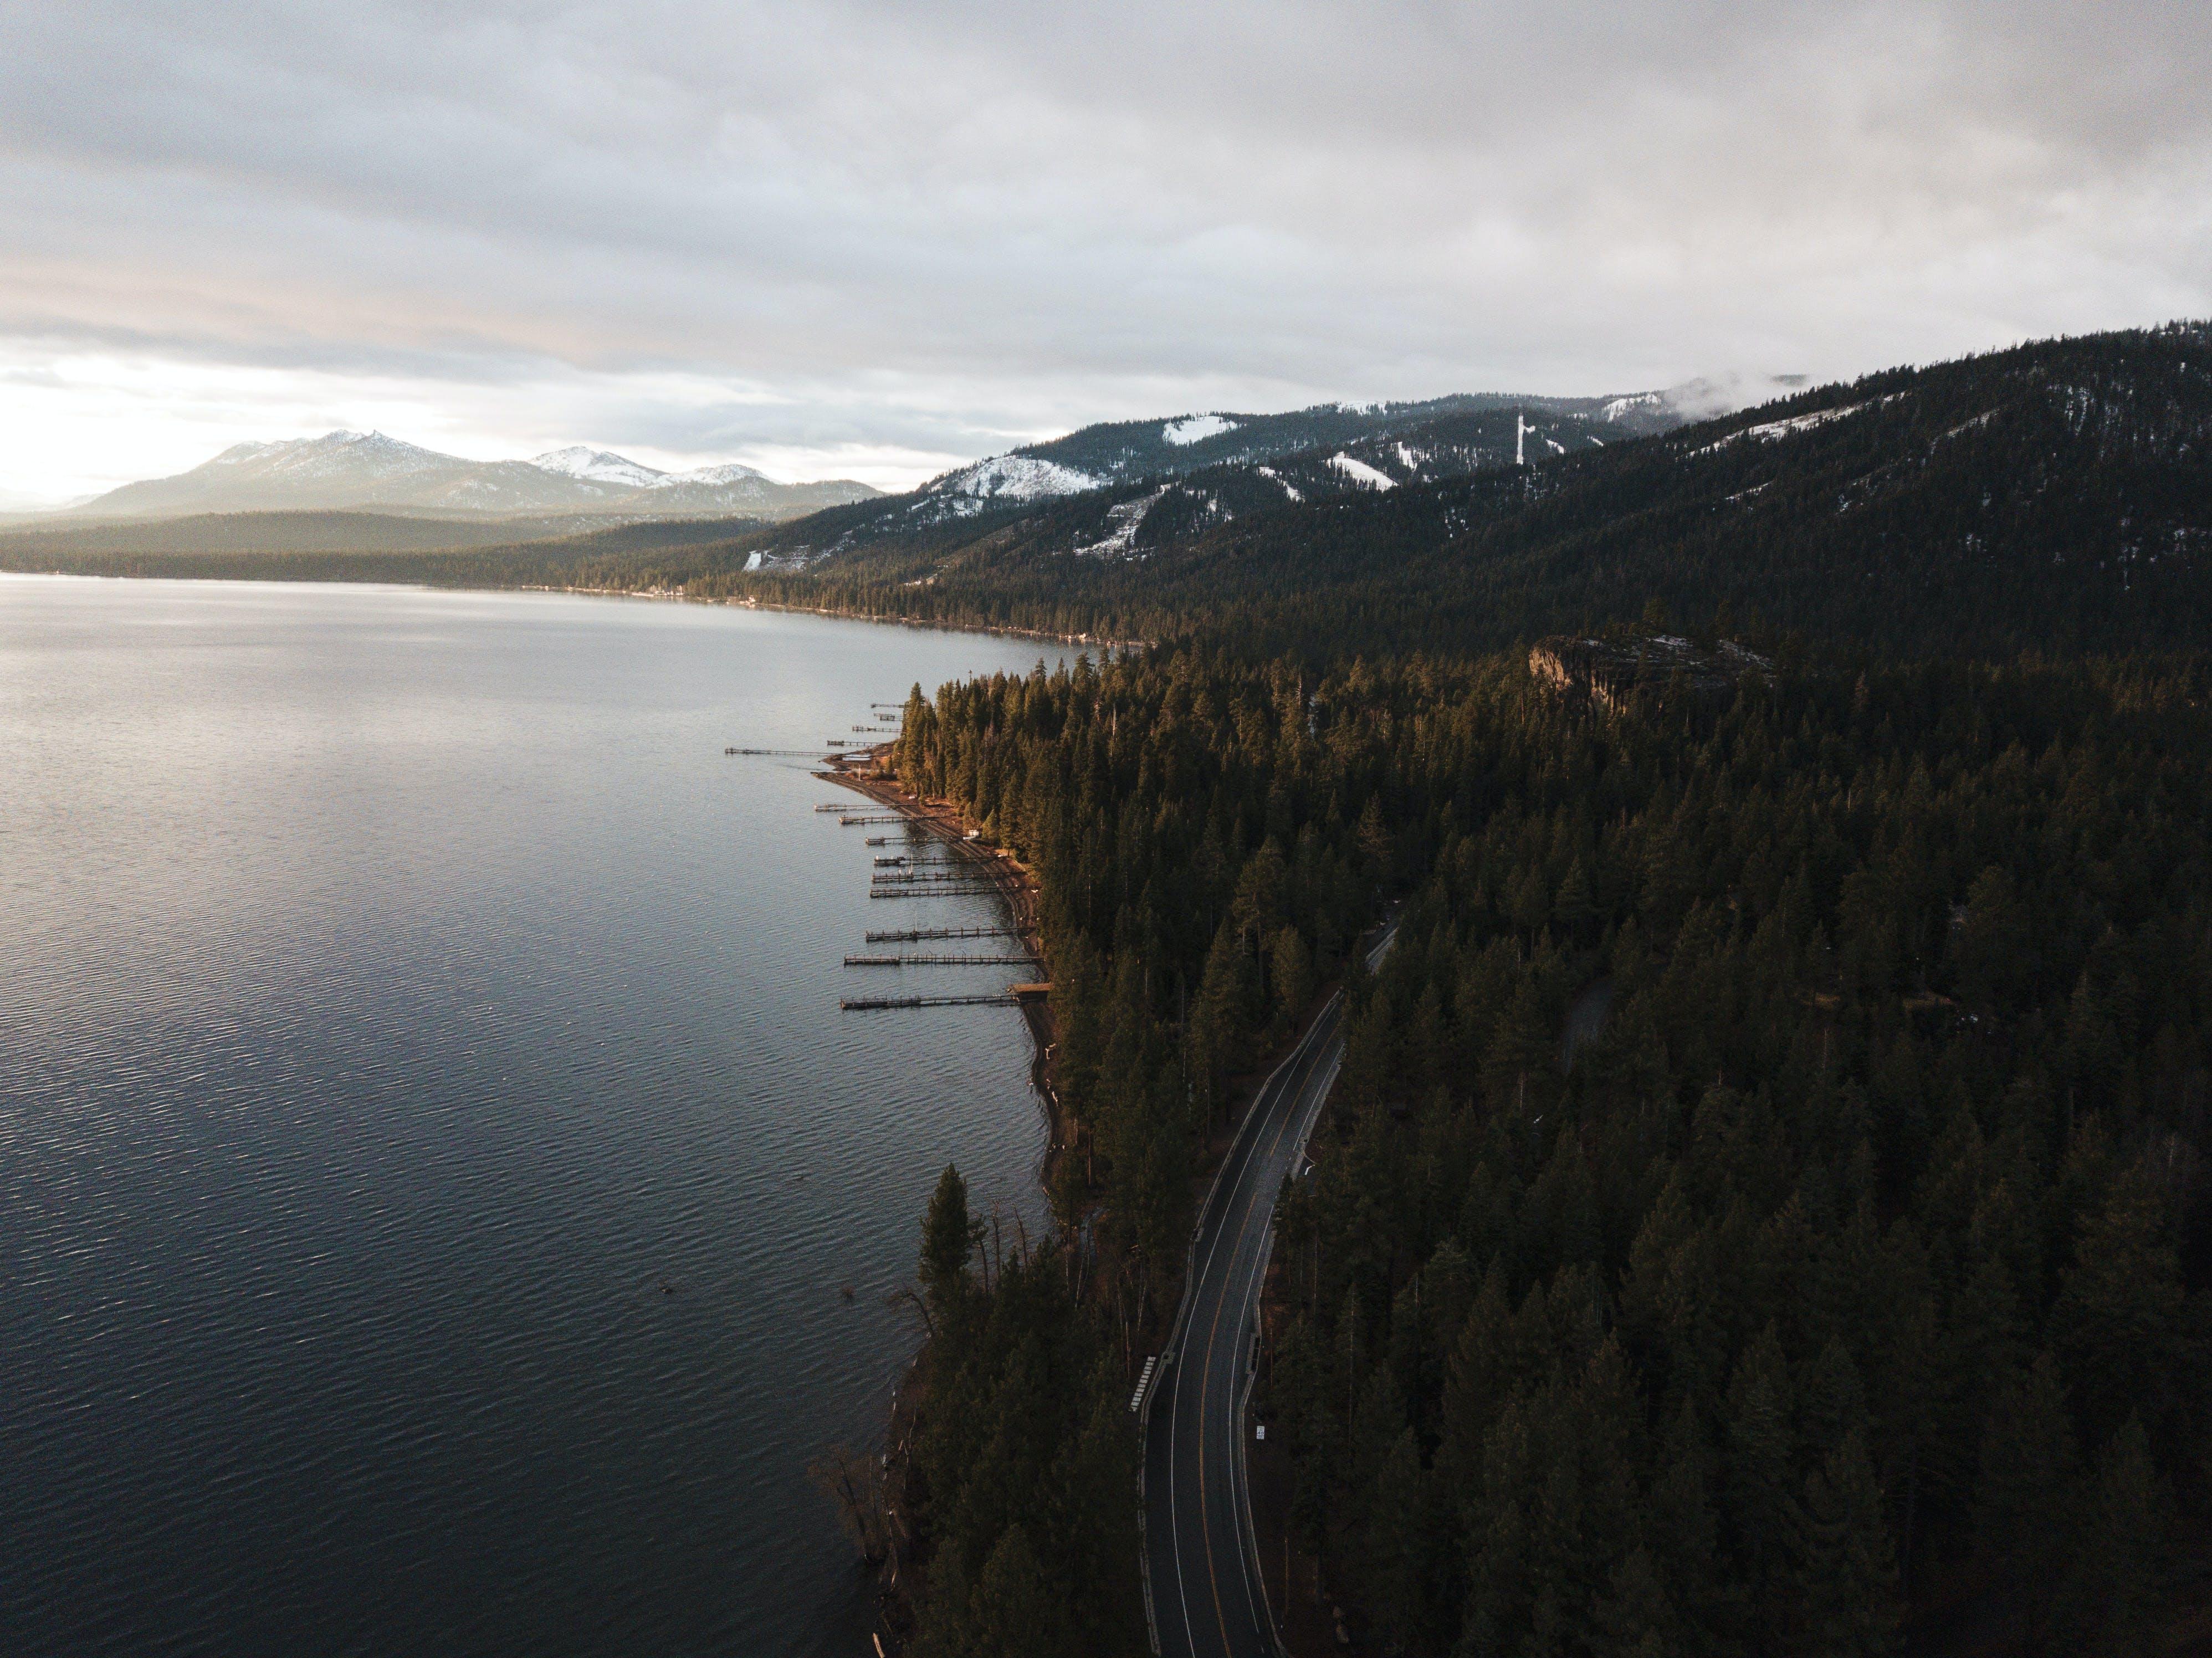 Kostenloses Stock Foto zu bäume, berge, bewölkt, gebirge